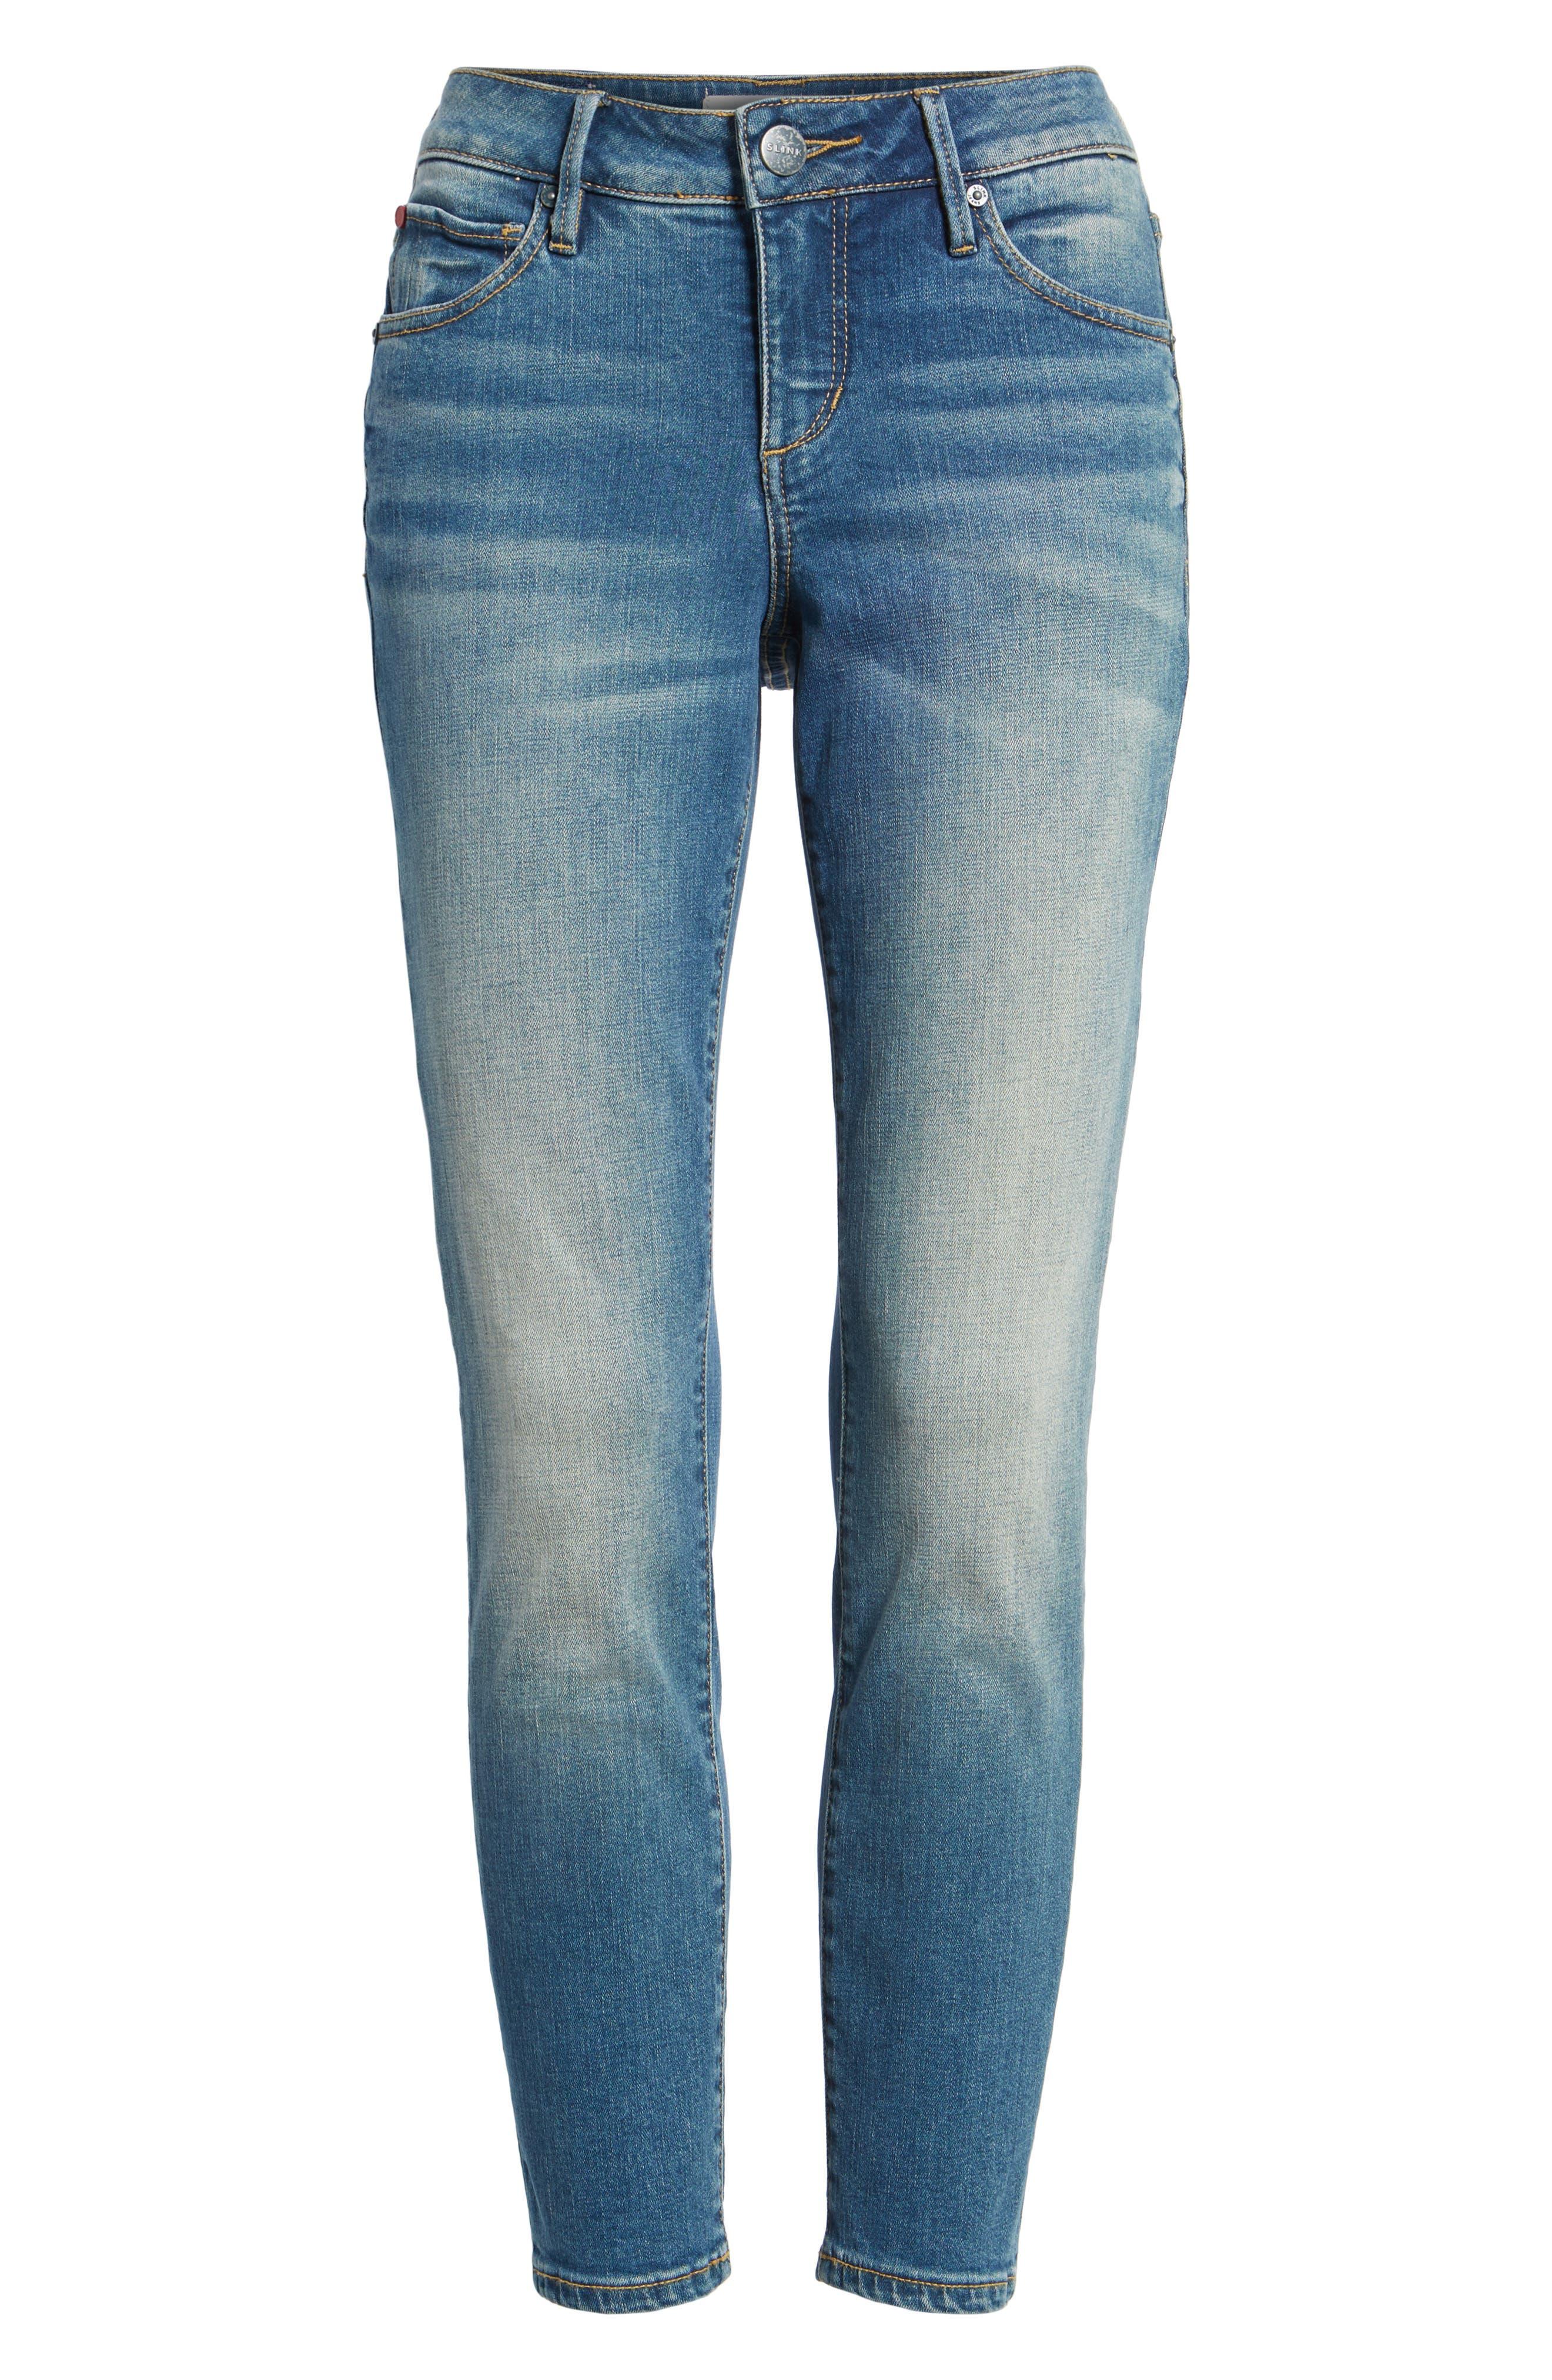 Boyfriend Ankle Jeans,                             Alternate thumbnail 6, color,                             BIRDY